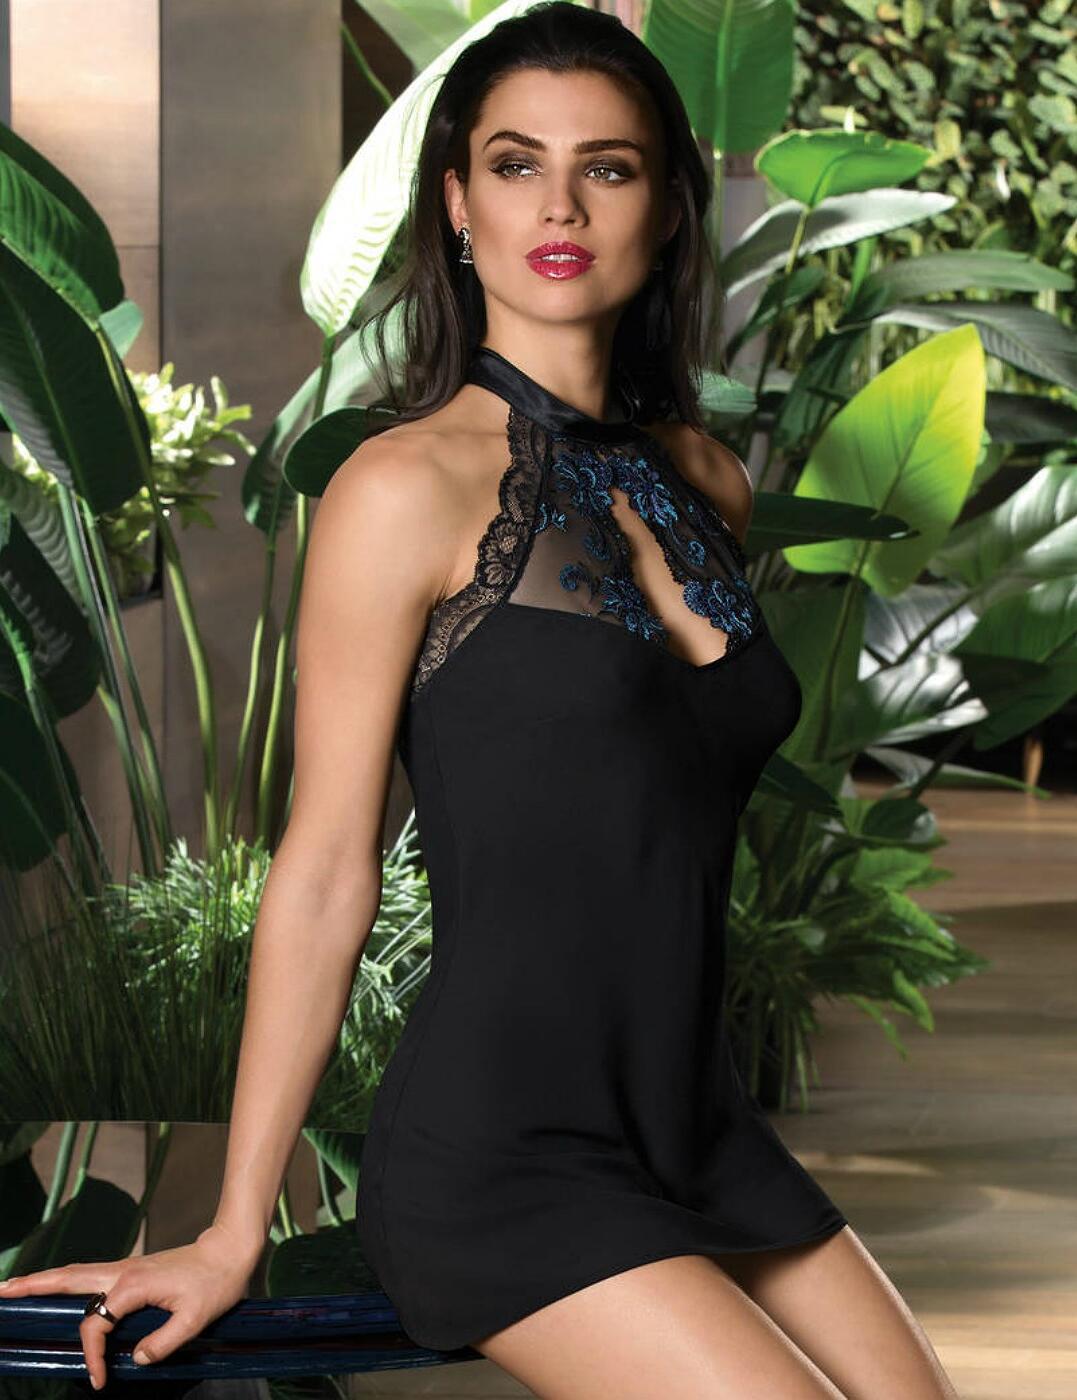 ALG1708 Lise Charmel Nuit Elegance Babydoll - ALG1708 Nuit Saphir